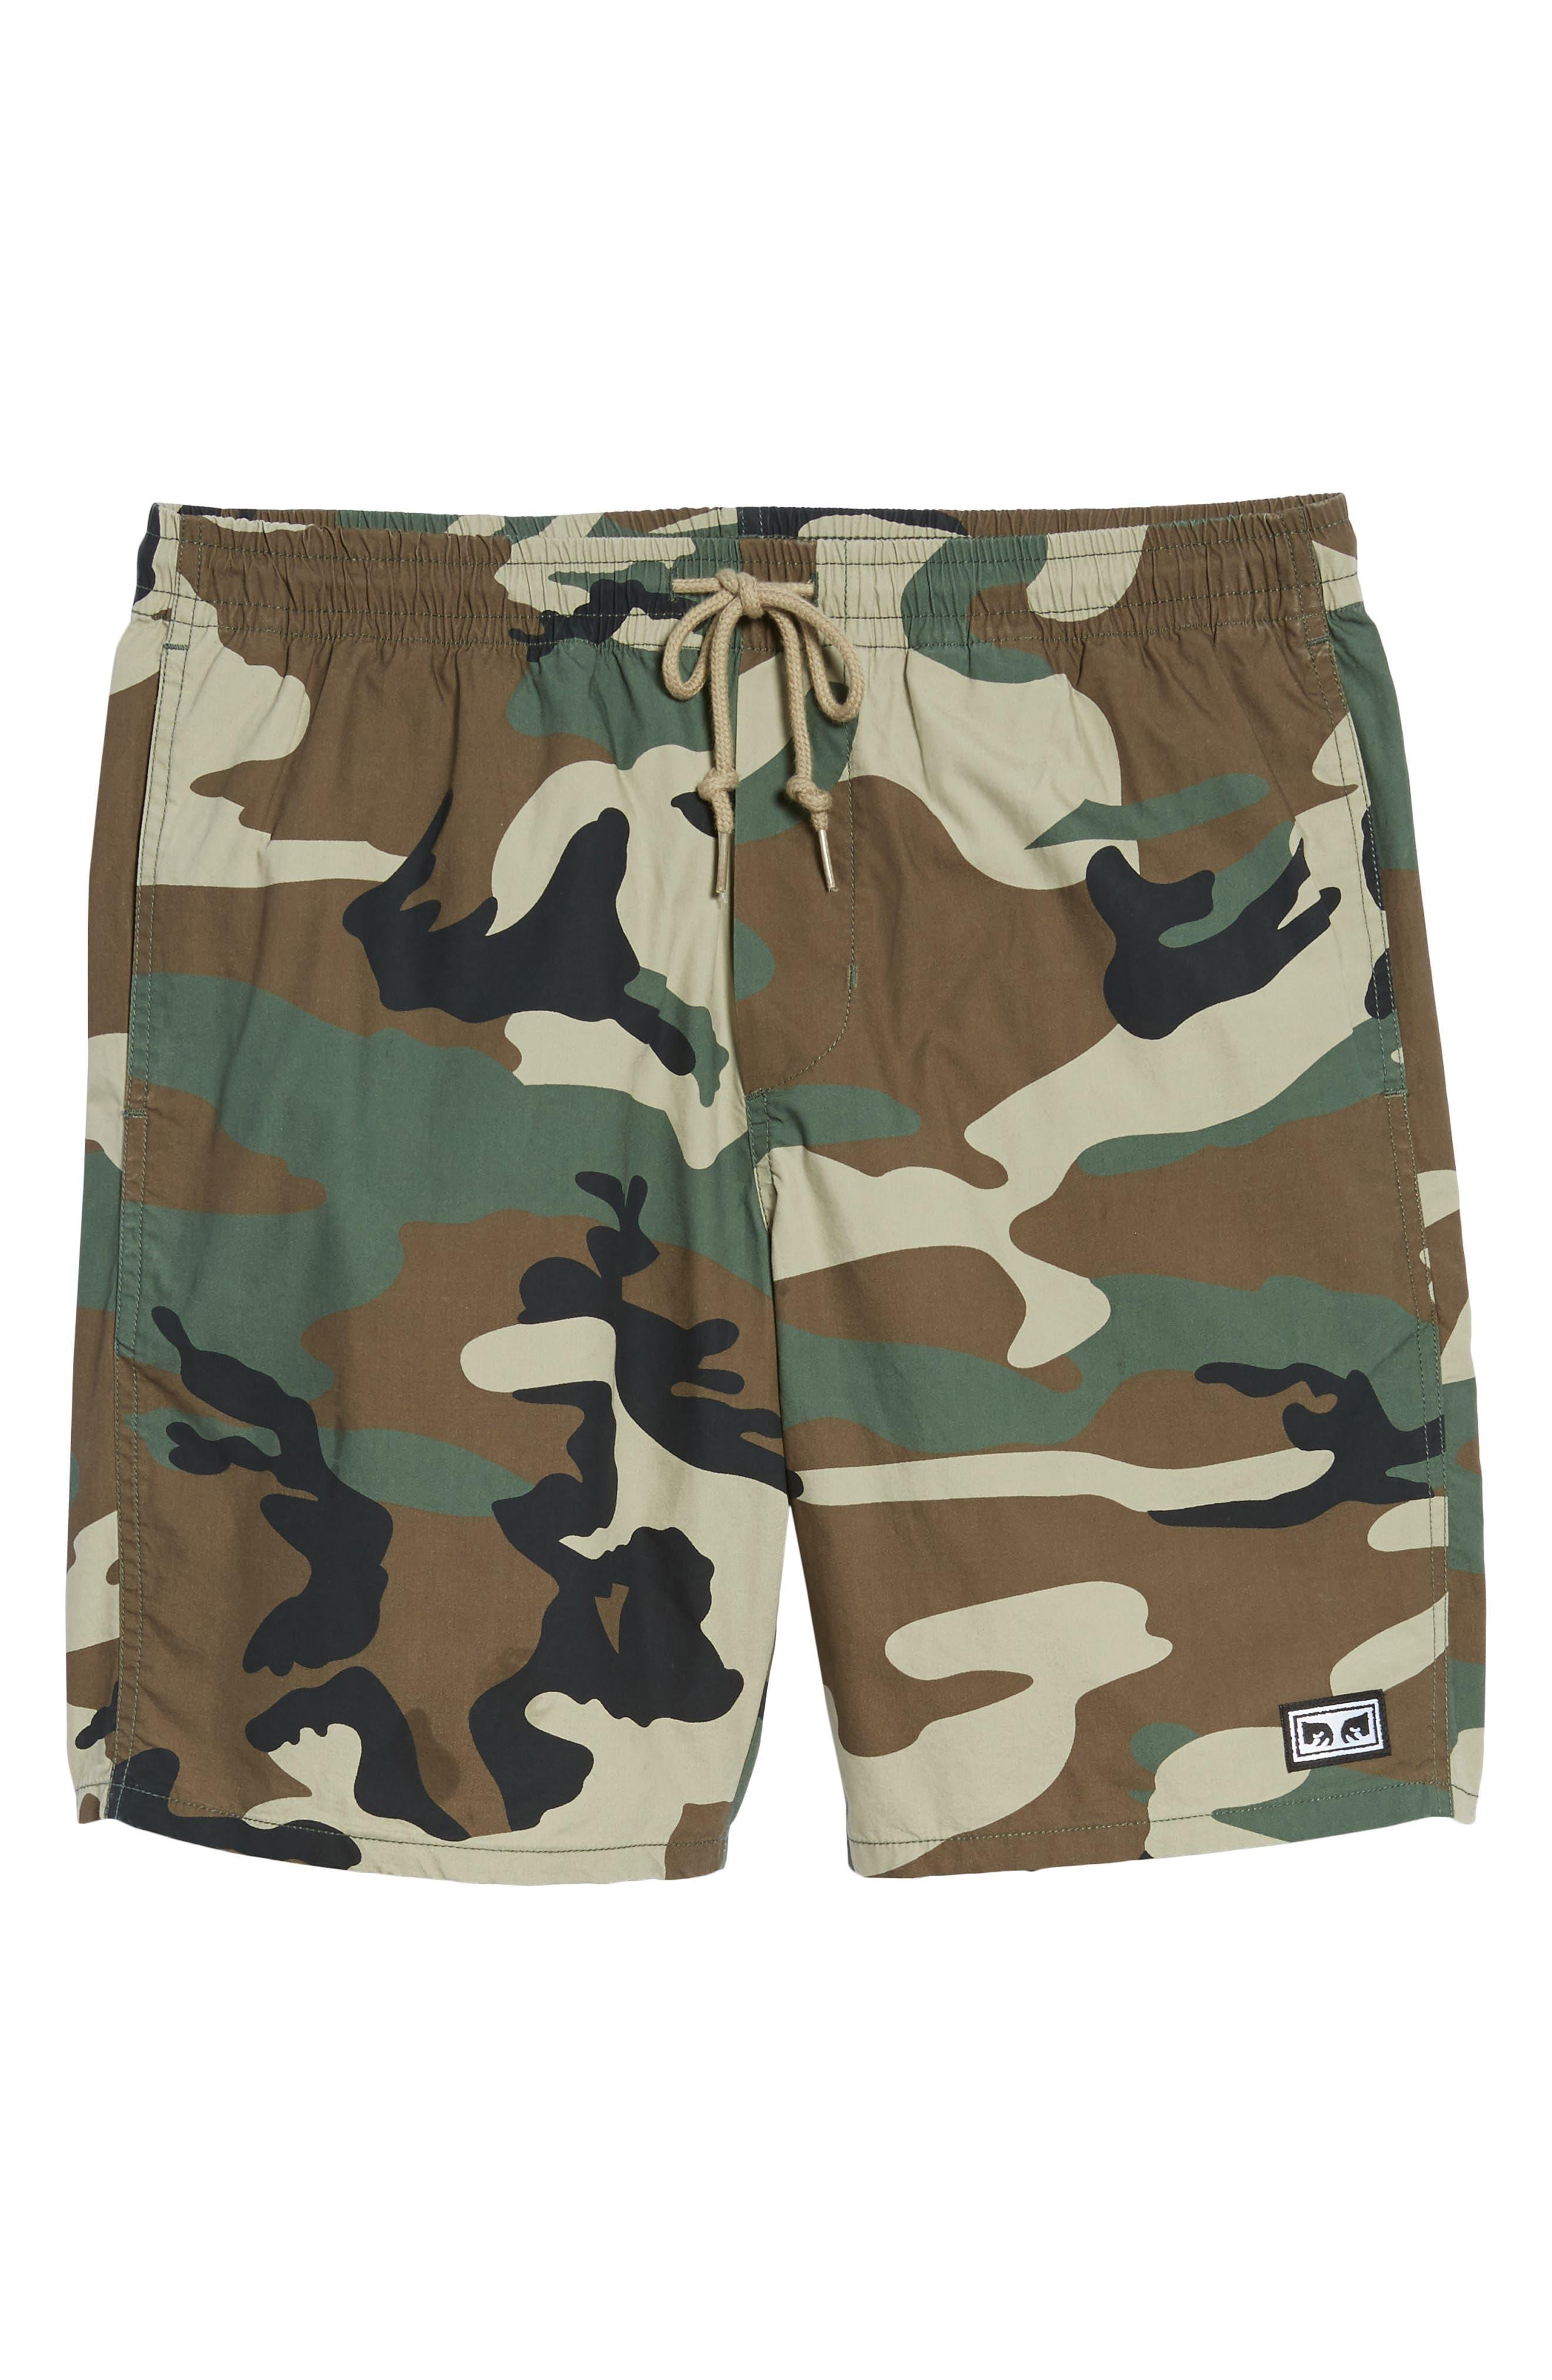 Subversion Shorts,                             Alternate thumbnail 6, color,                             Field Camo